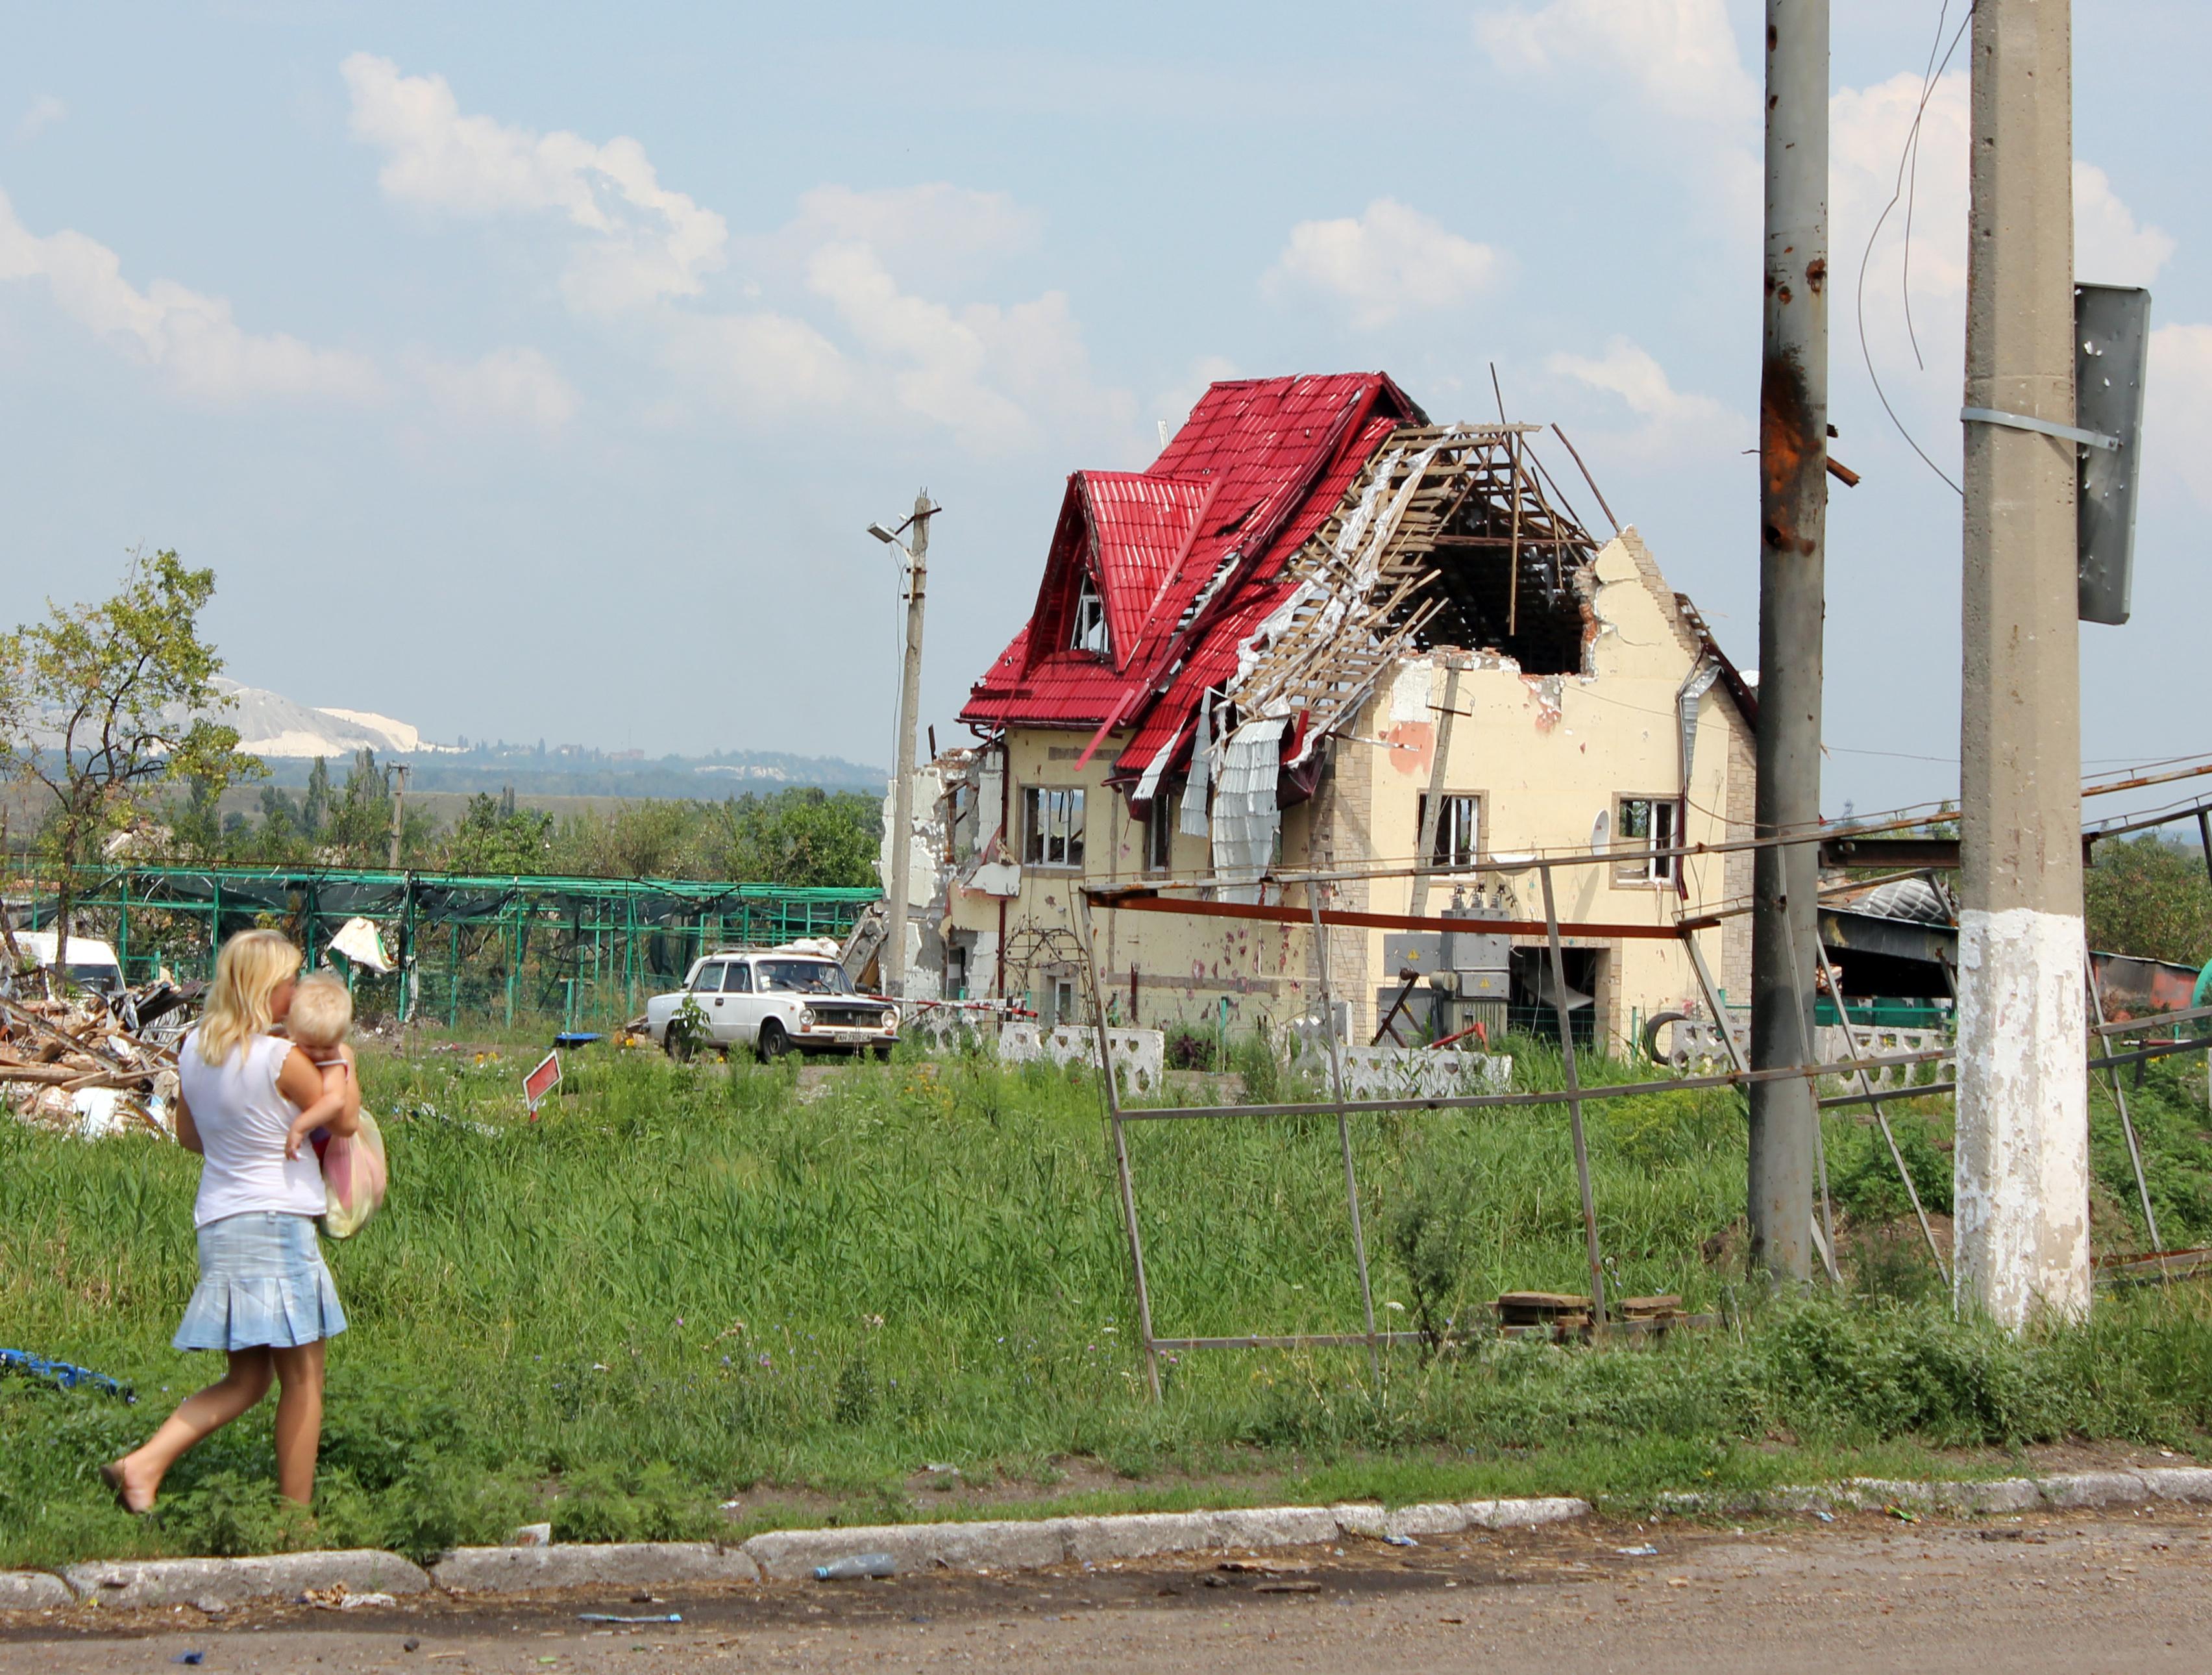 Ukraine named third worst in suffering